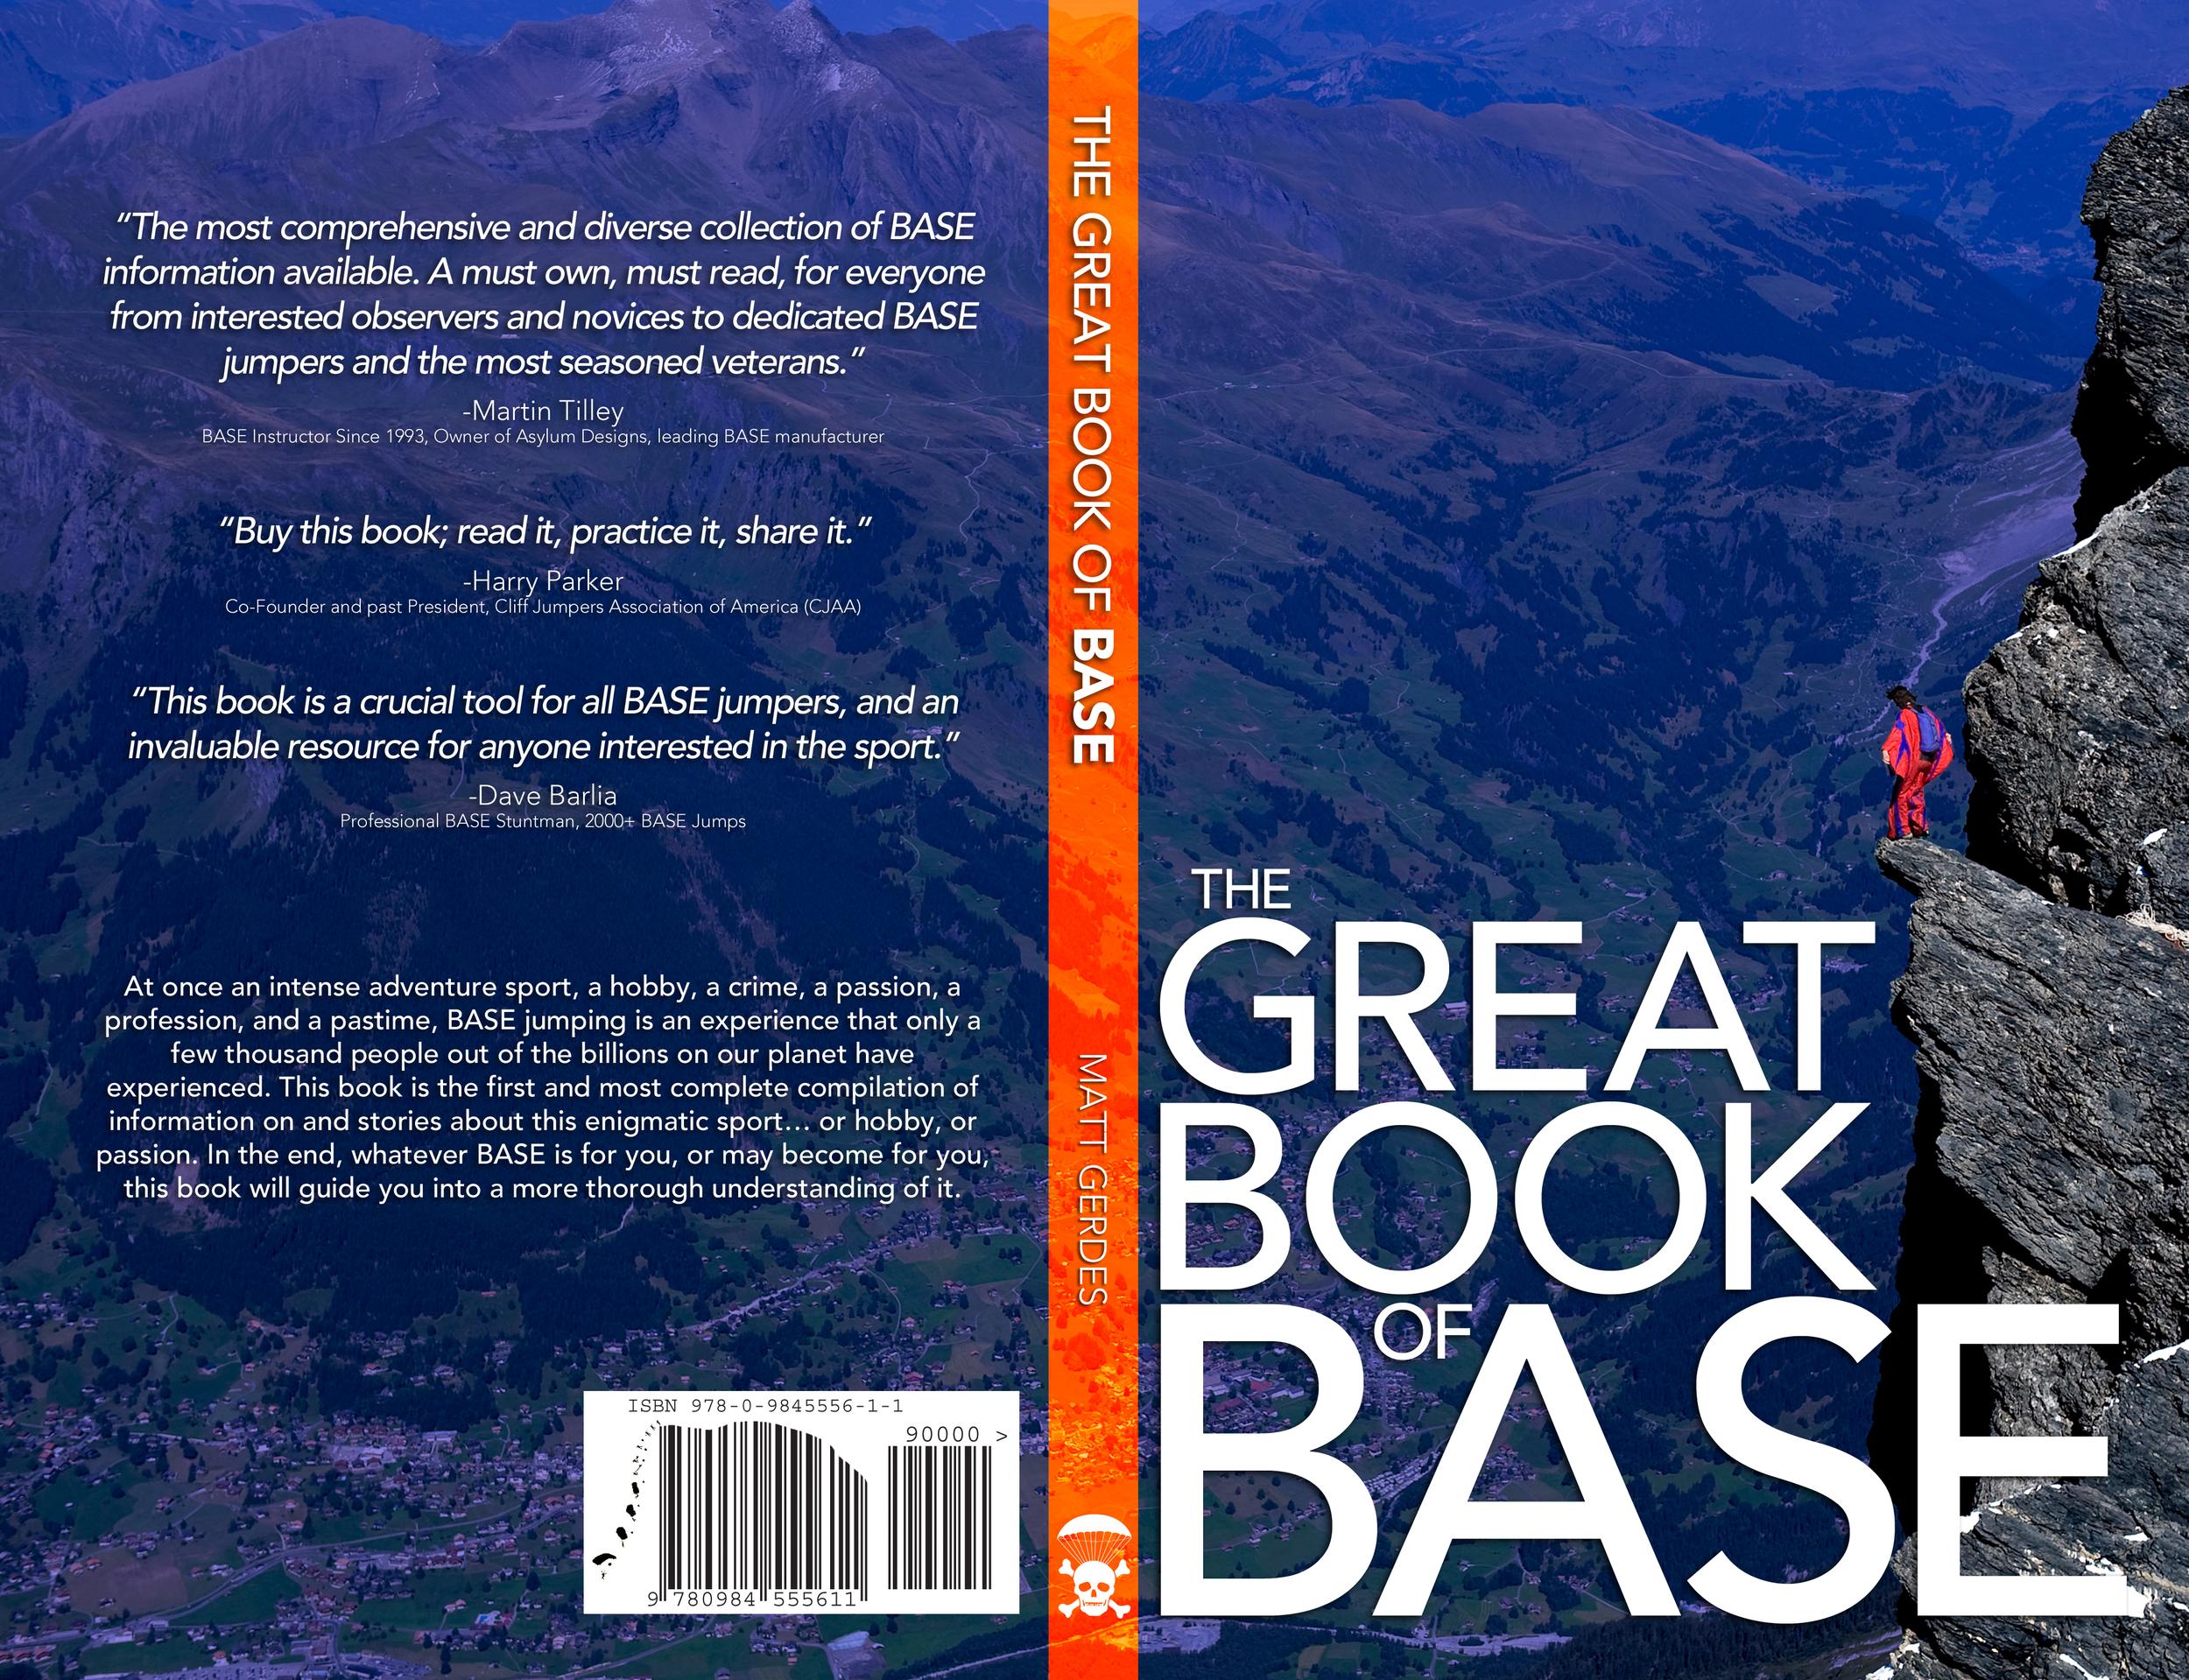 GBOB_COVER FINAL BONES.jpg